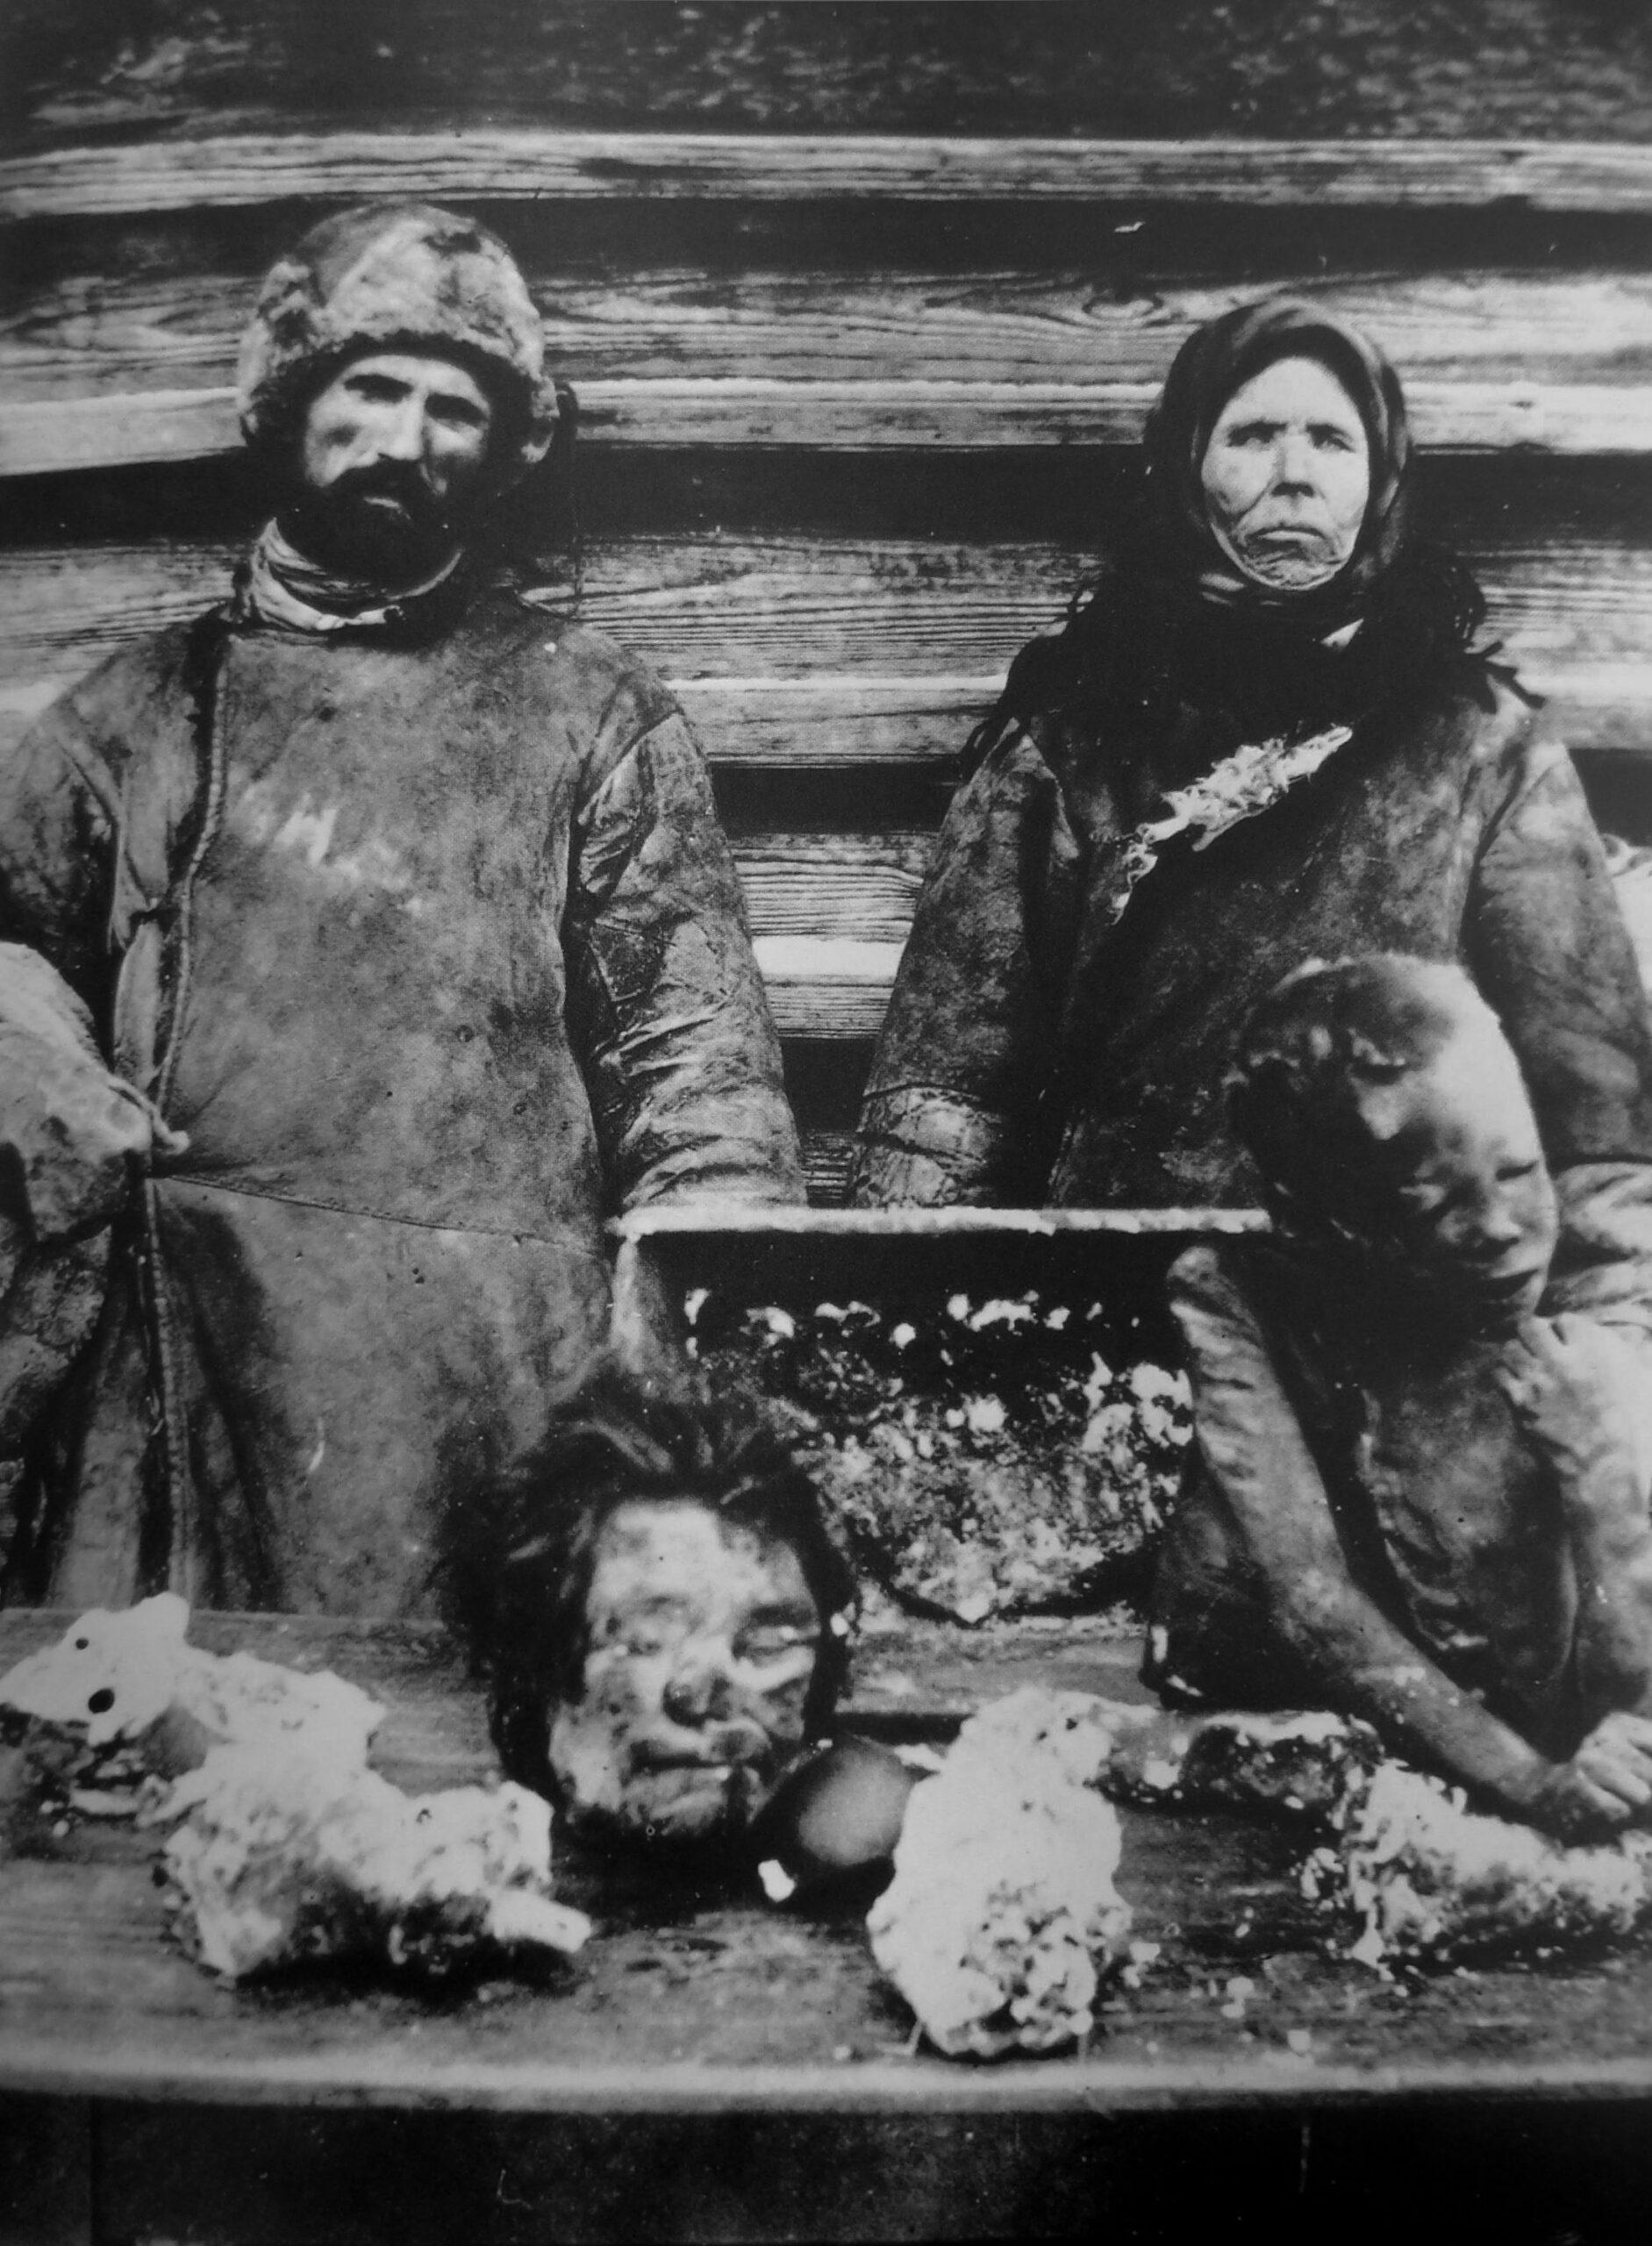 Kanibalismus Rusko